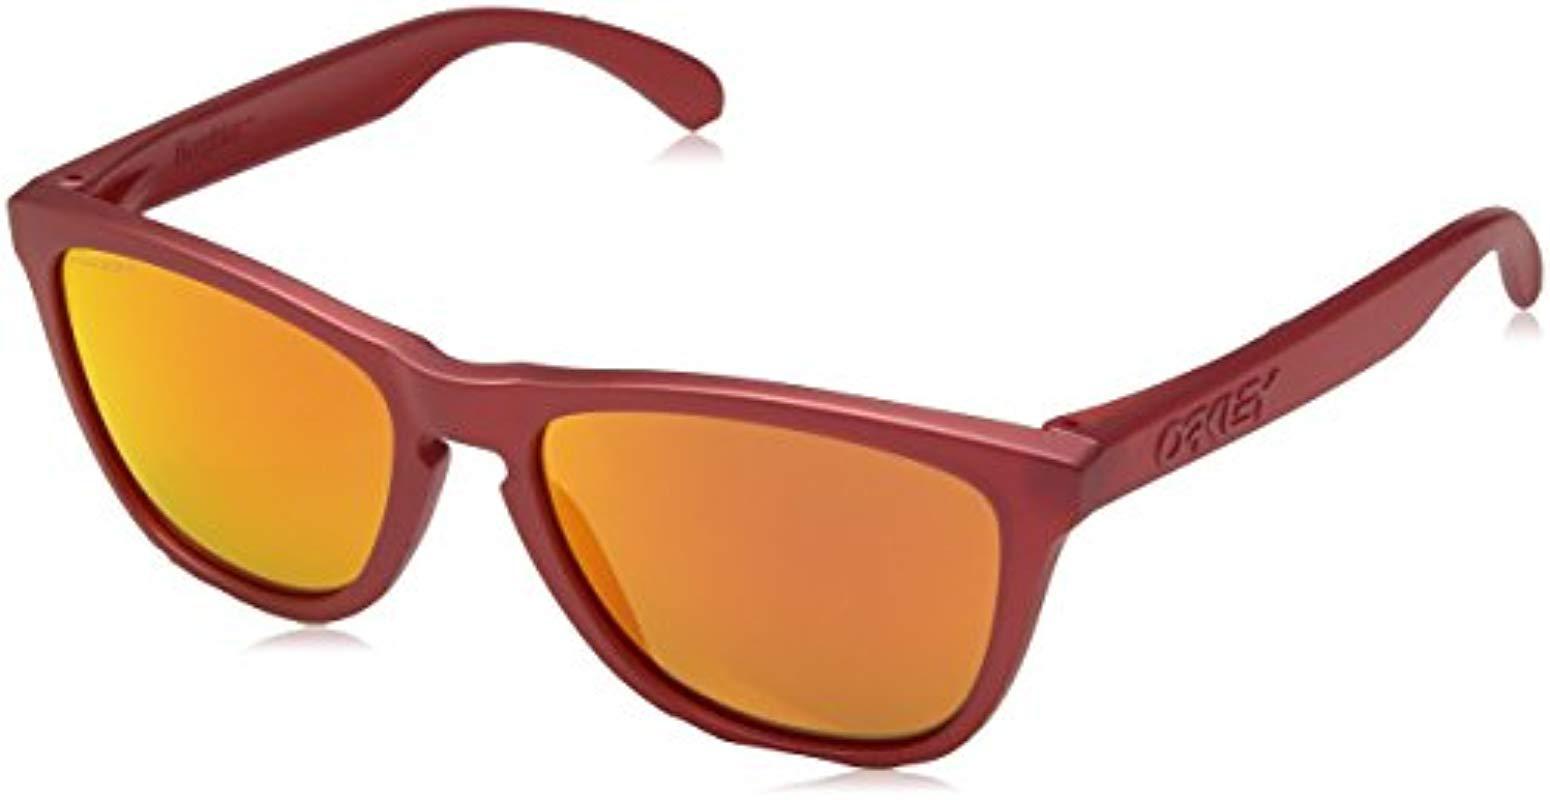 48d8e1b6b0c Oakley. Men s Frogskins 9013c8 Sunglasses ...